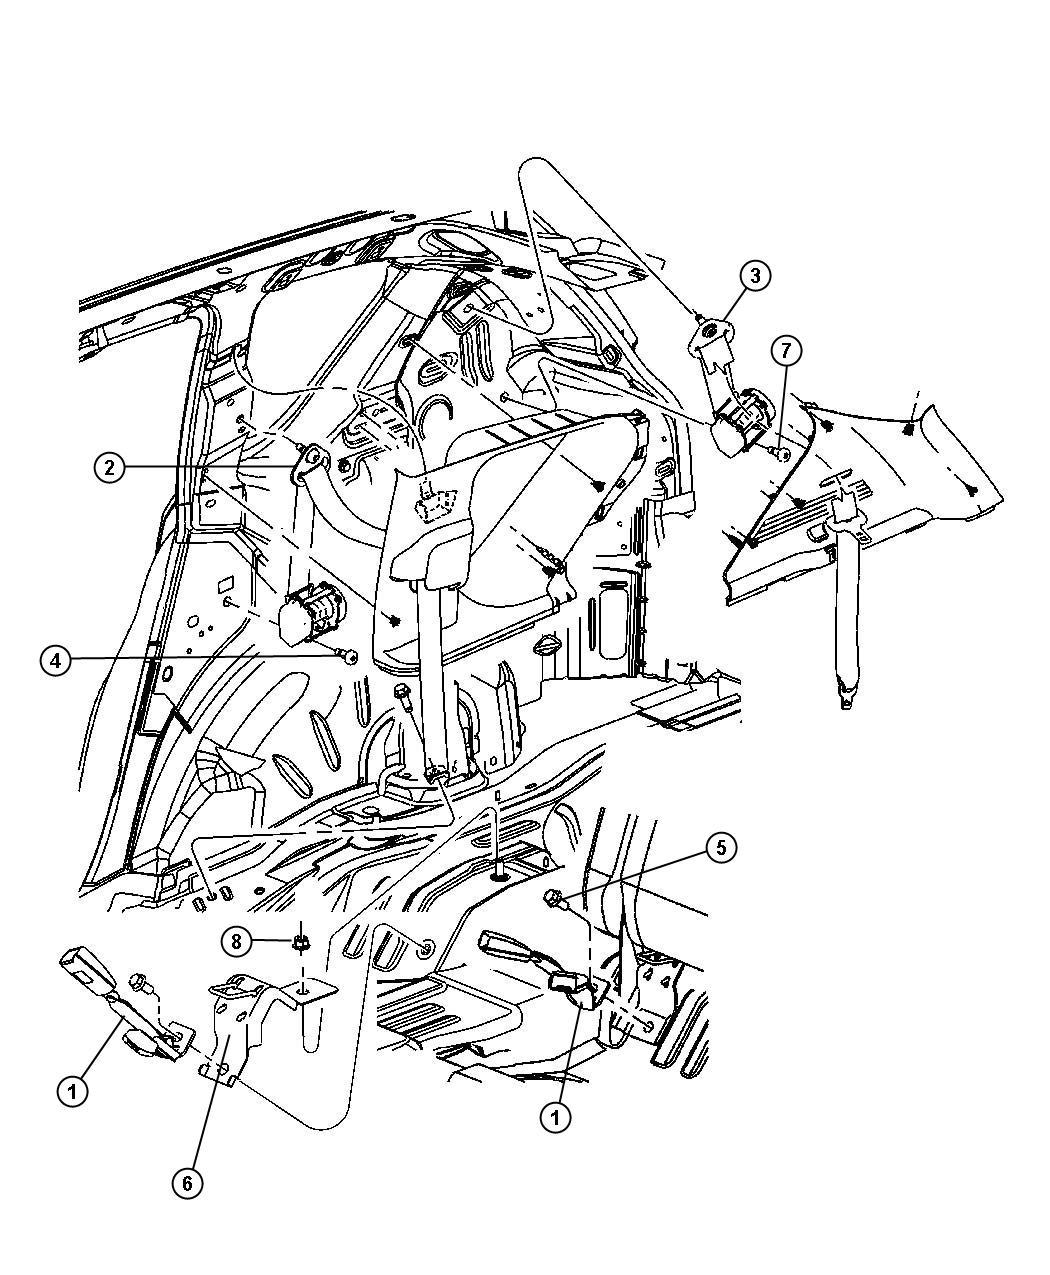 2008 jeep patriot seat belt. rear inner. right. [ka]. trim ... jeep patriot wiring diagram for 2012 jeep patriot belt diagram